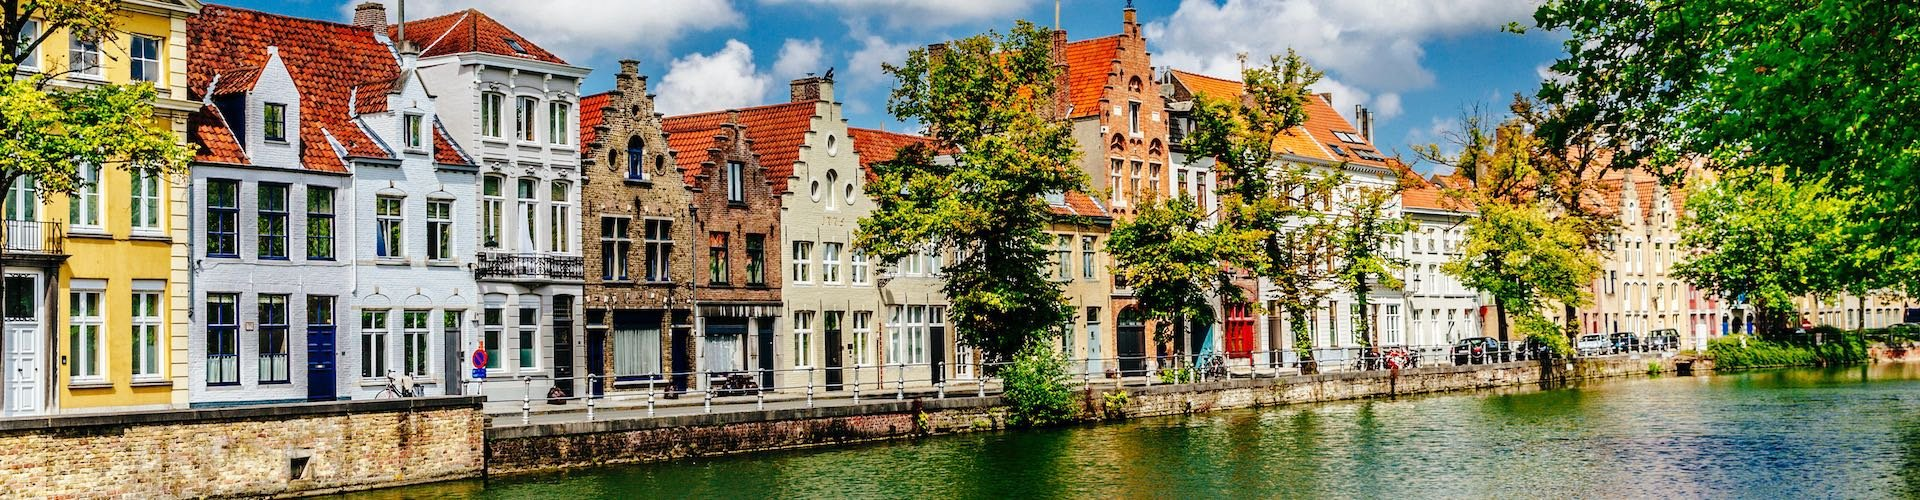 Familienurlaub in Belgien